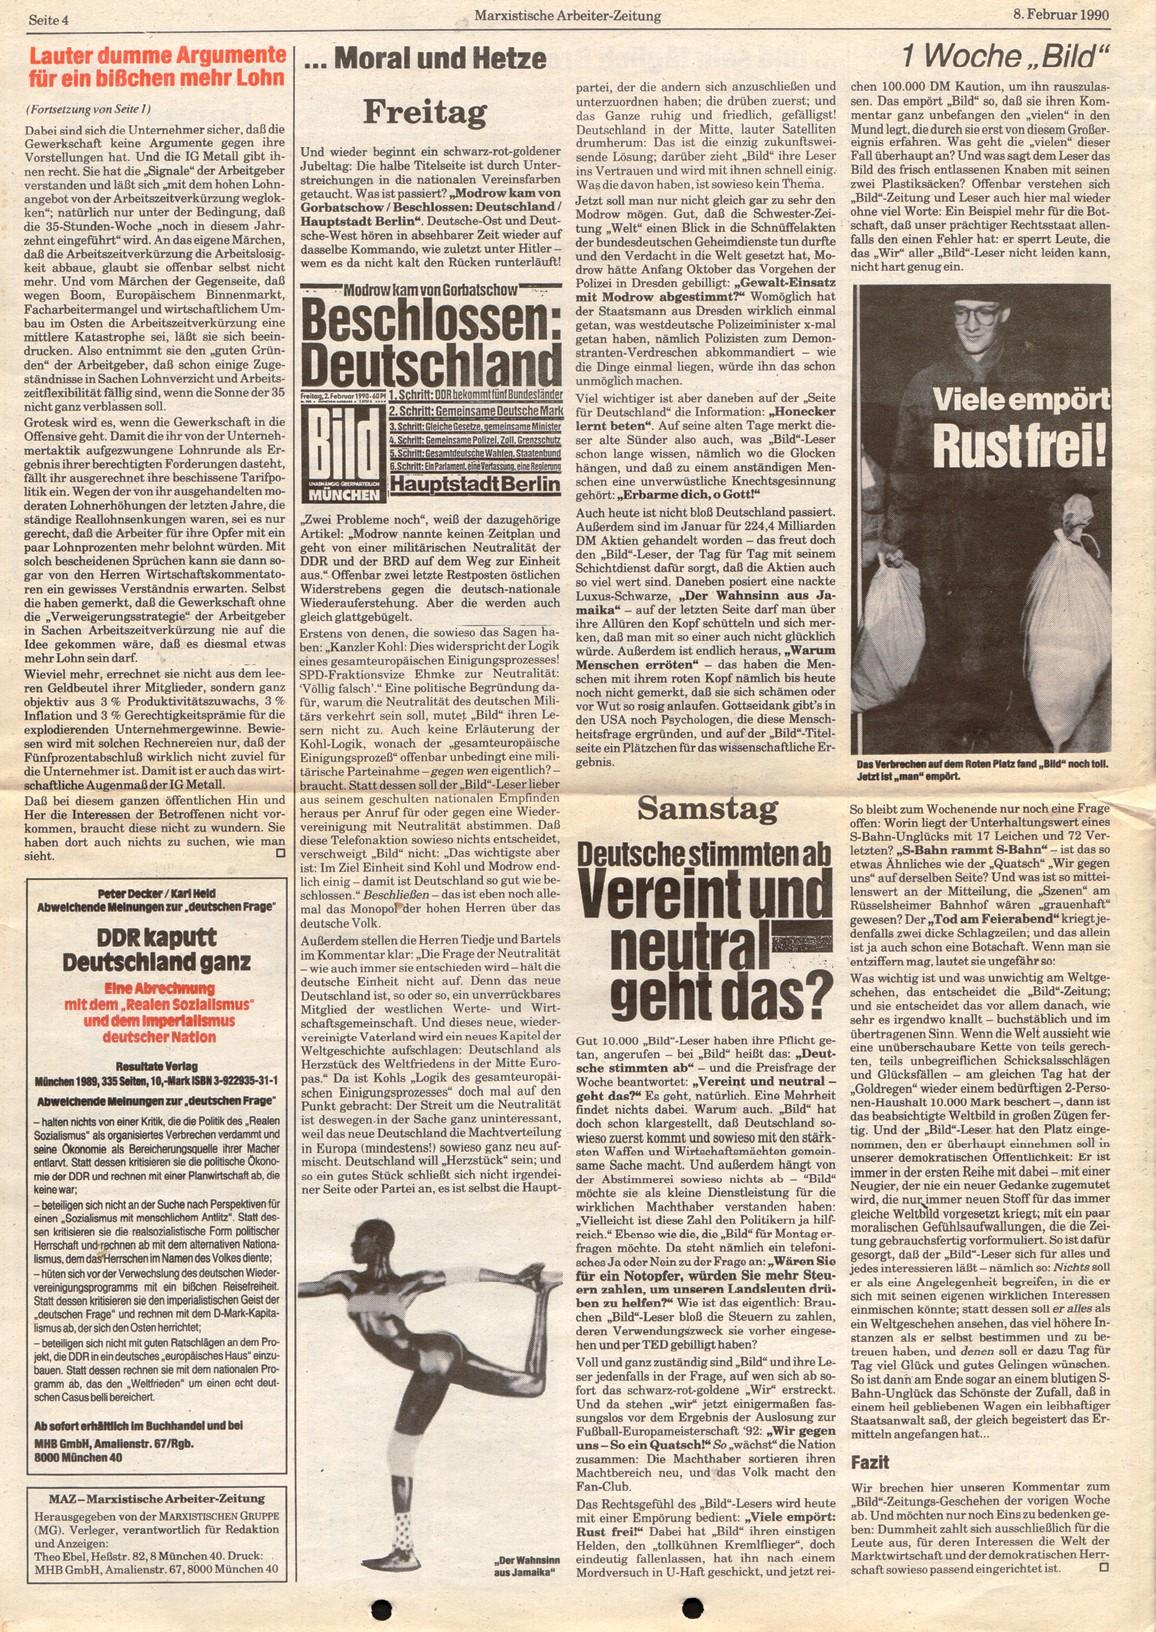 Muenchen_MG_MAZ_19900208_04